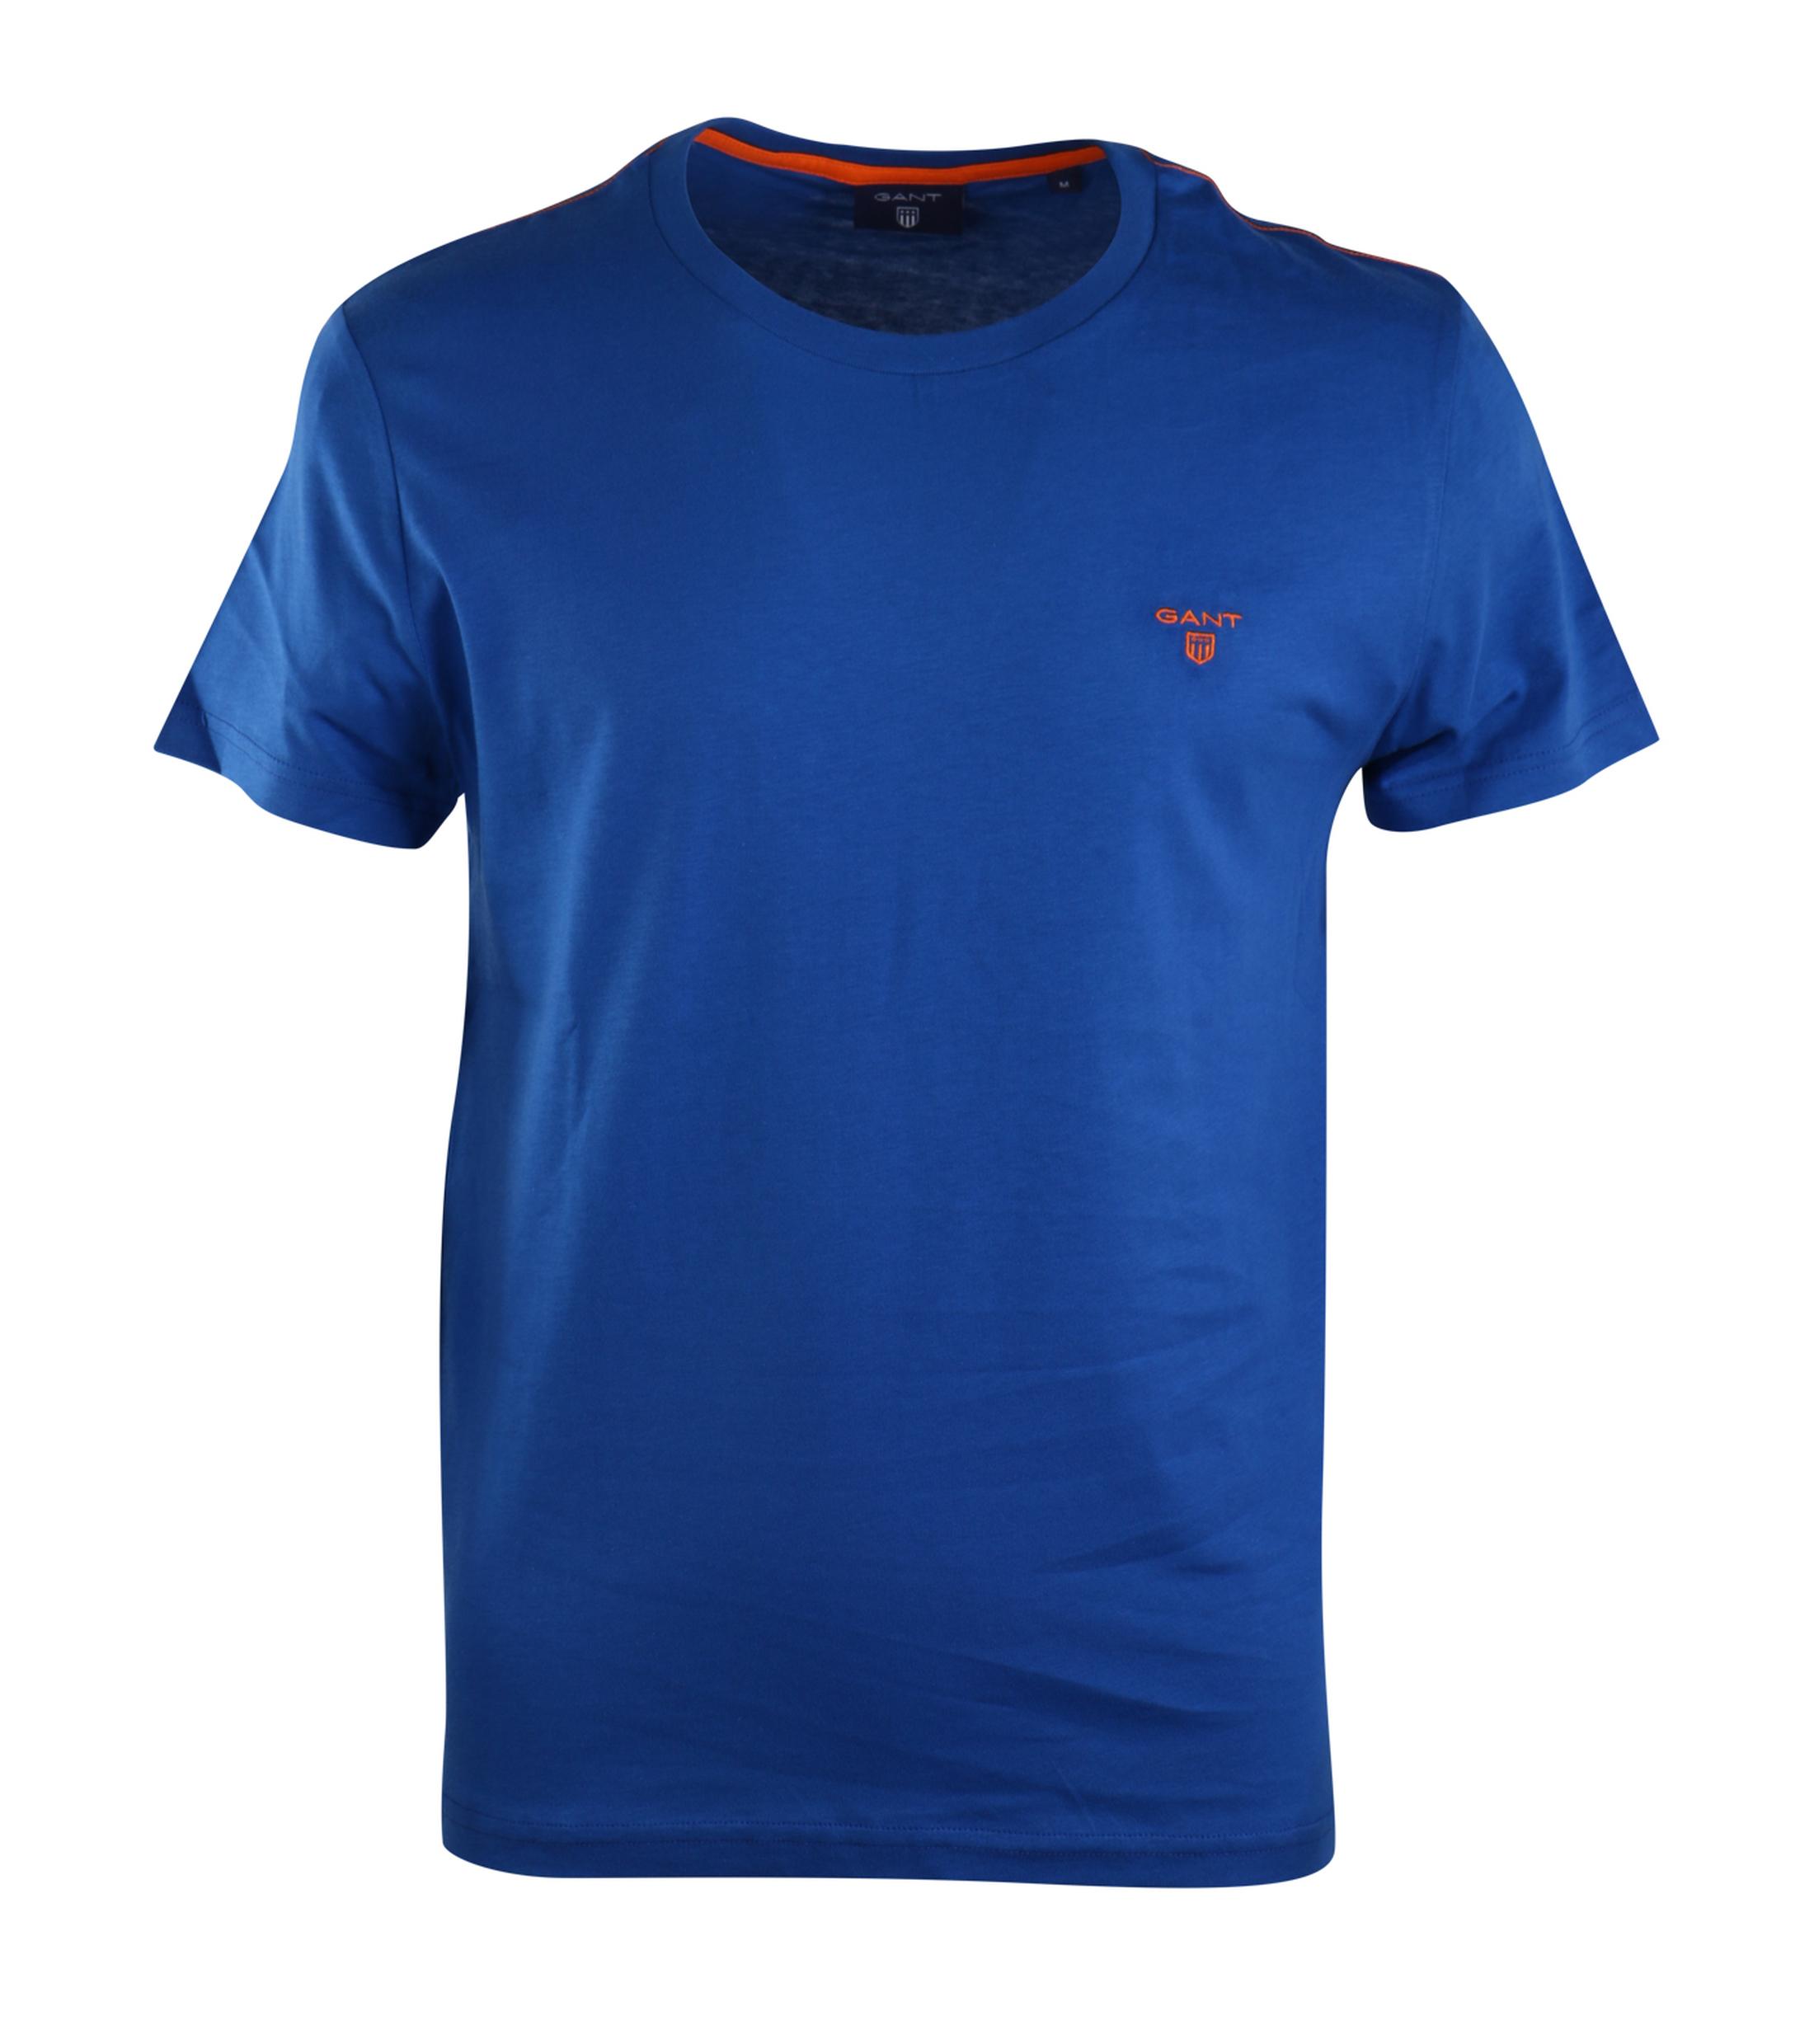 Gant t shirt contrast logo ocean blue for Ocean blue t shirt